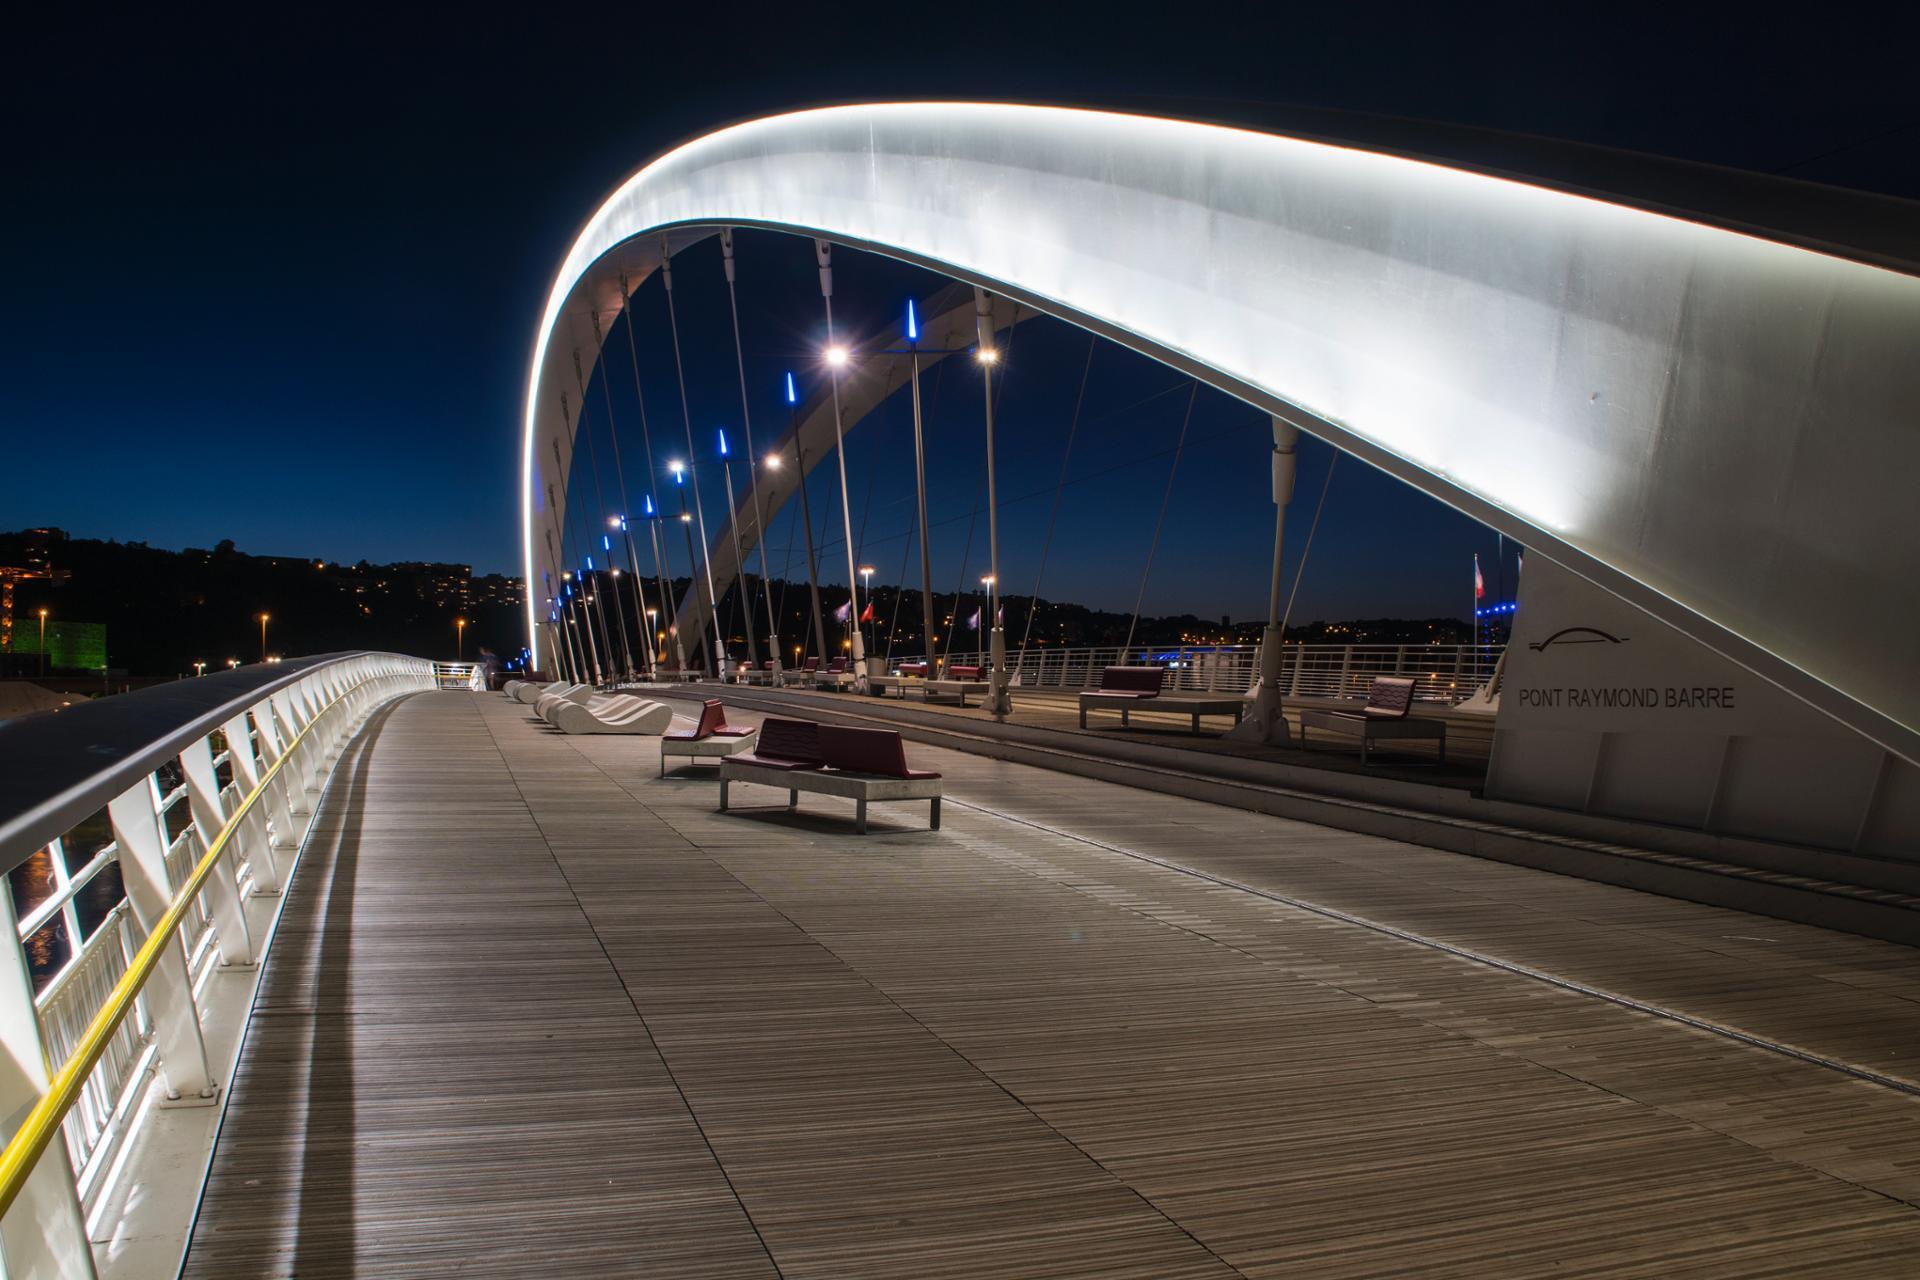 Pont Raymond Barre - Lyon.